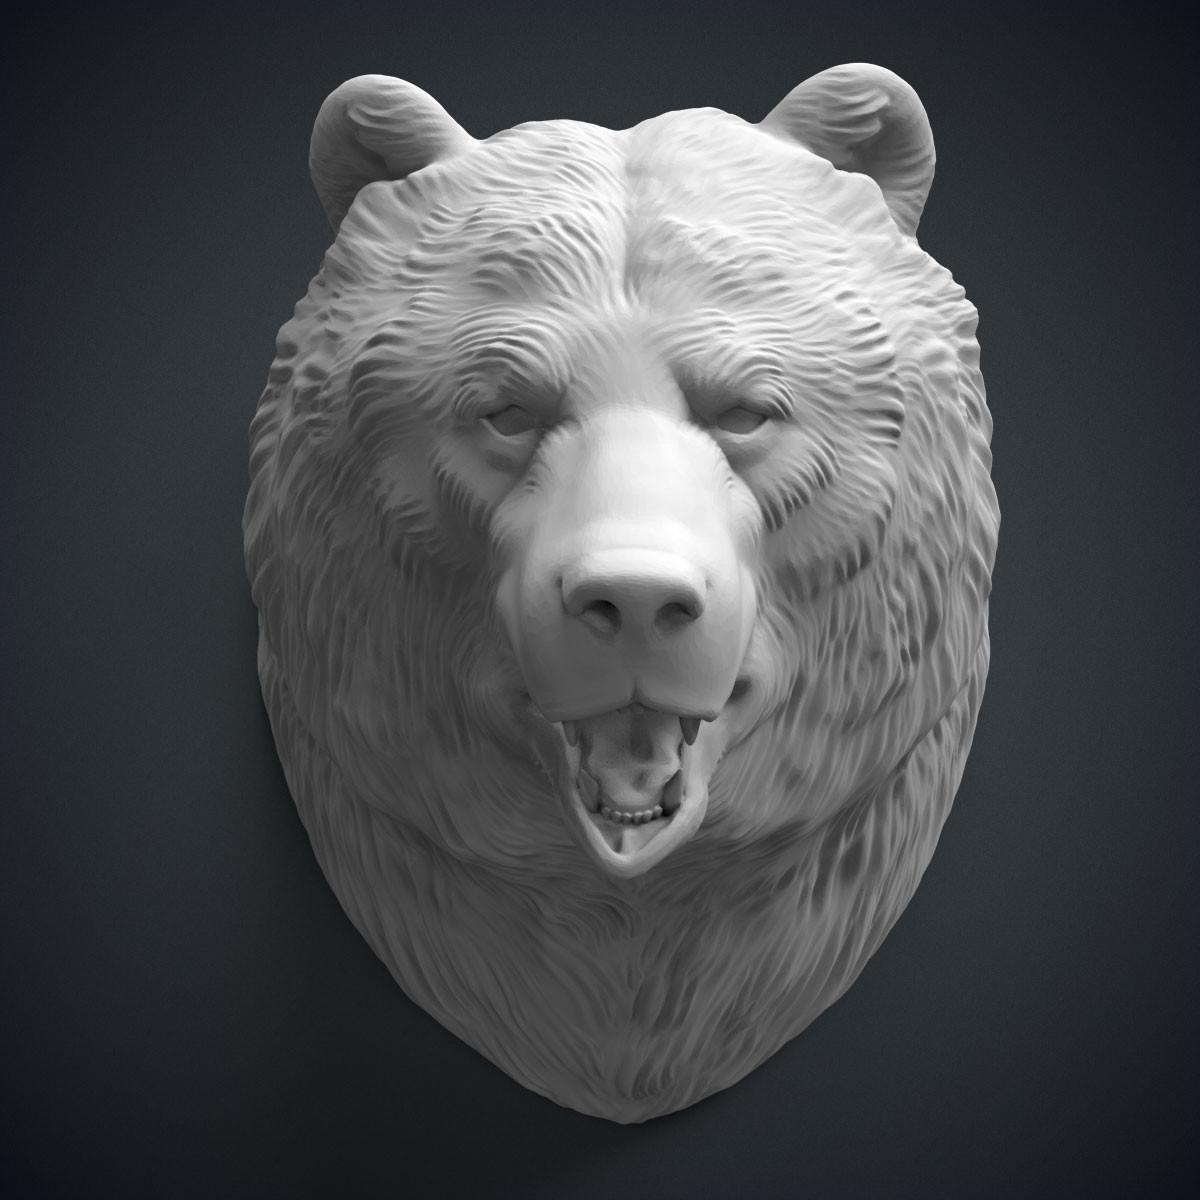 3d-model-bear-head-sculpture-solid-01.jpg